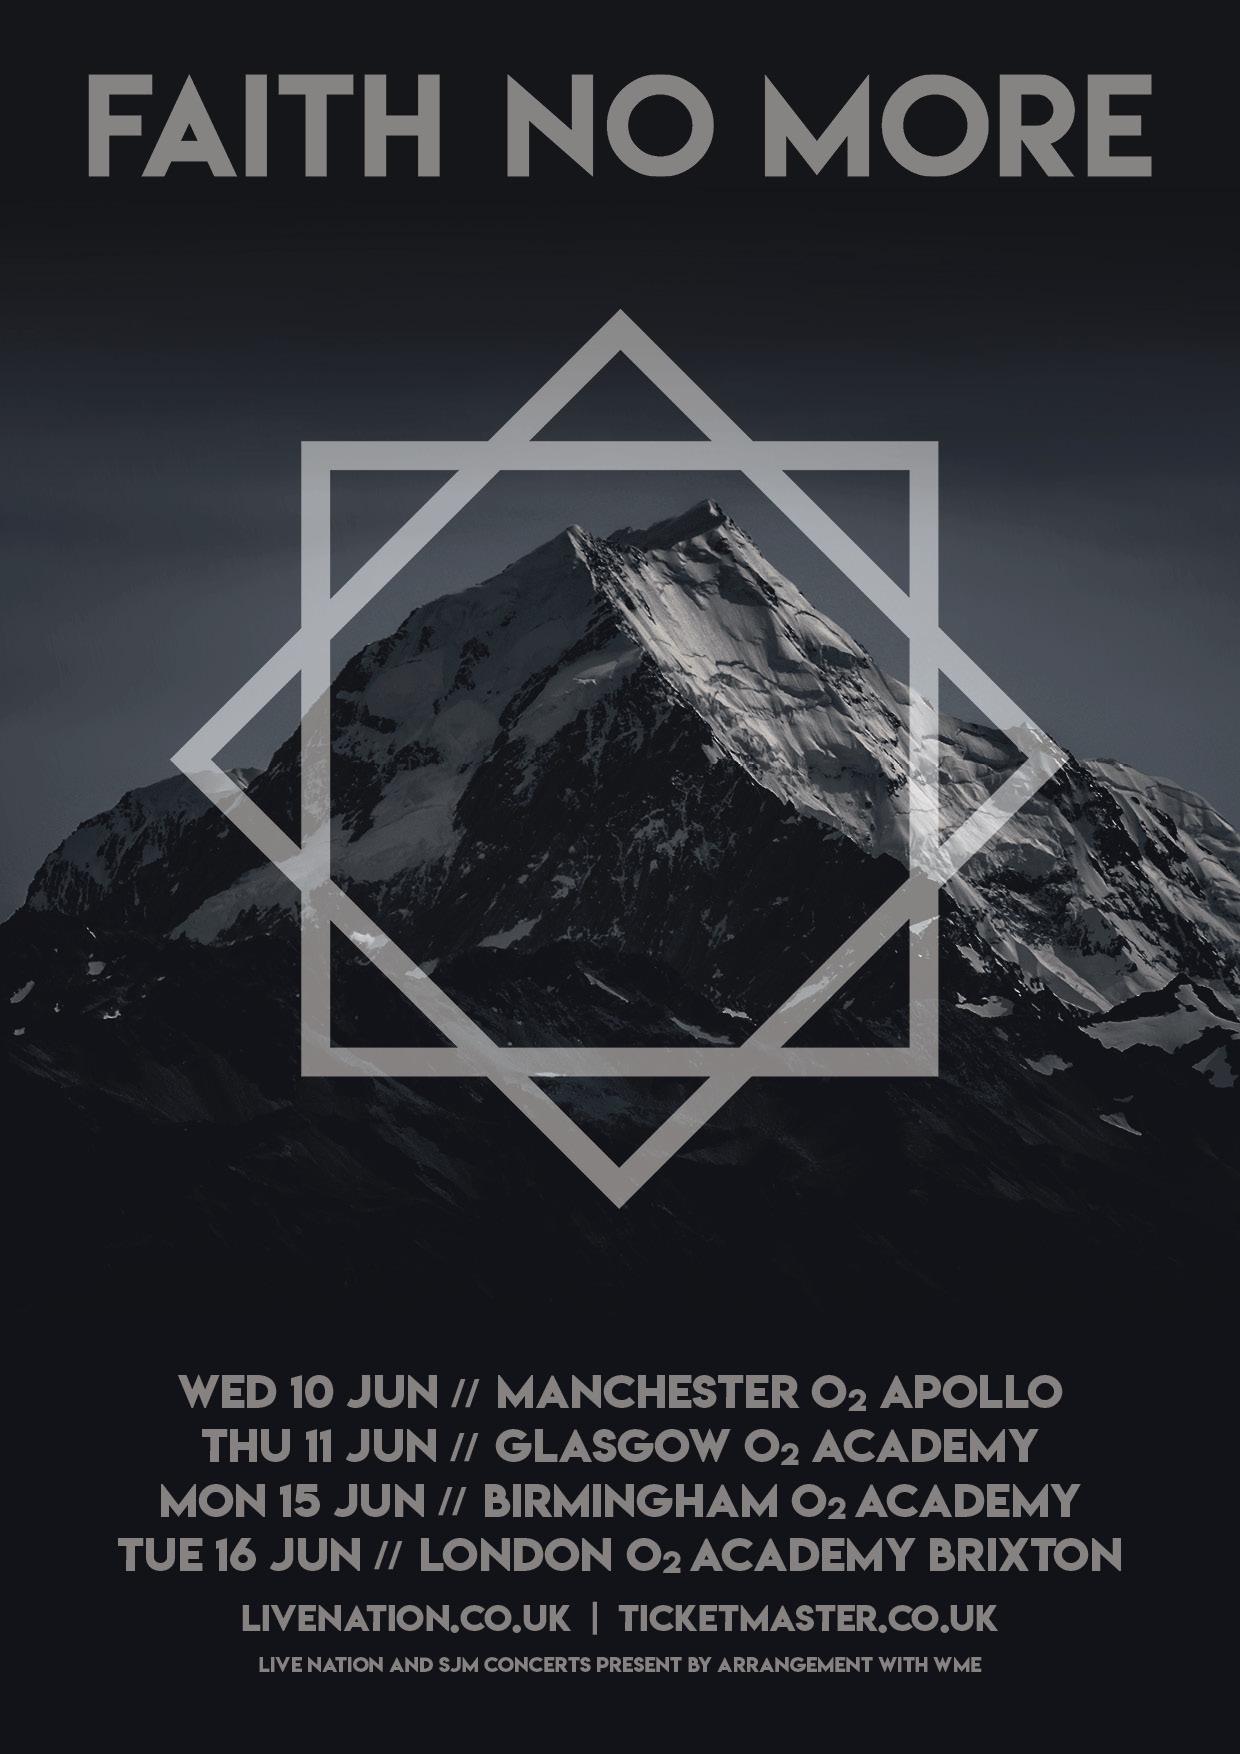 Faith No More Extend European Outing, Announce UK Headlining Dates